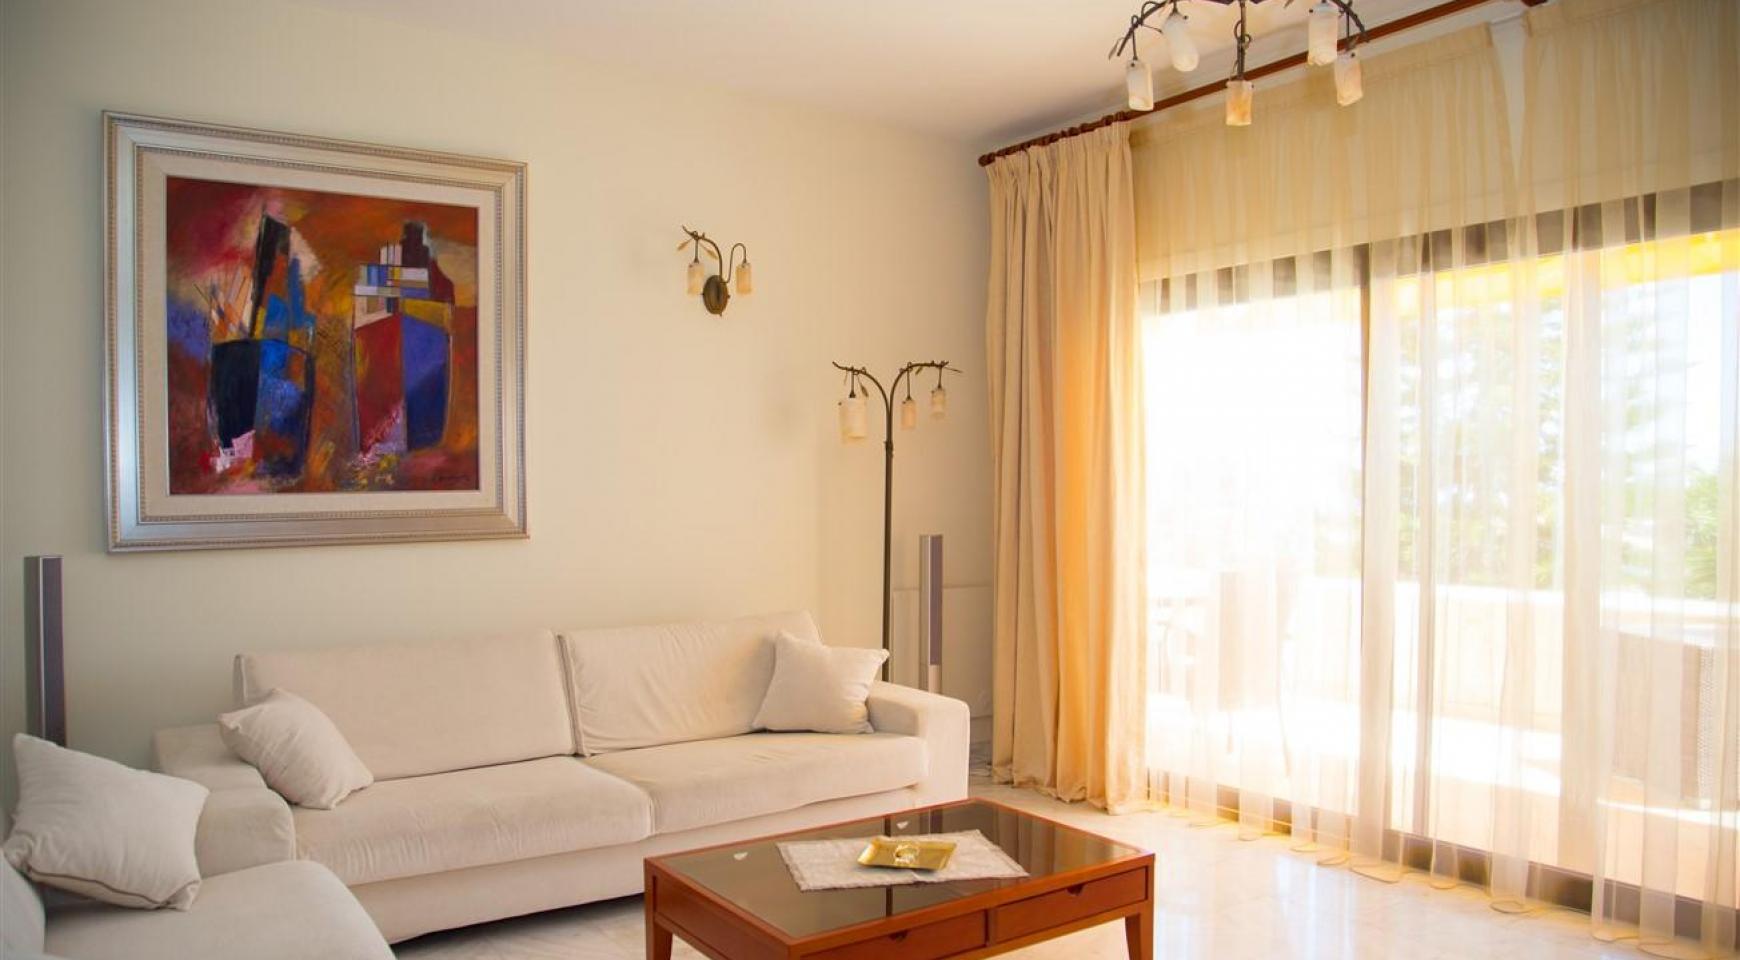 3-Спальная Квартира на Берегу Моря в Комплексе Thera   - 32